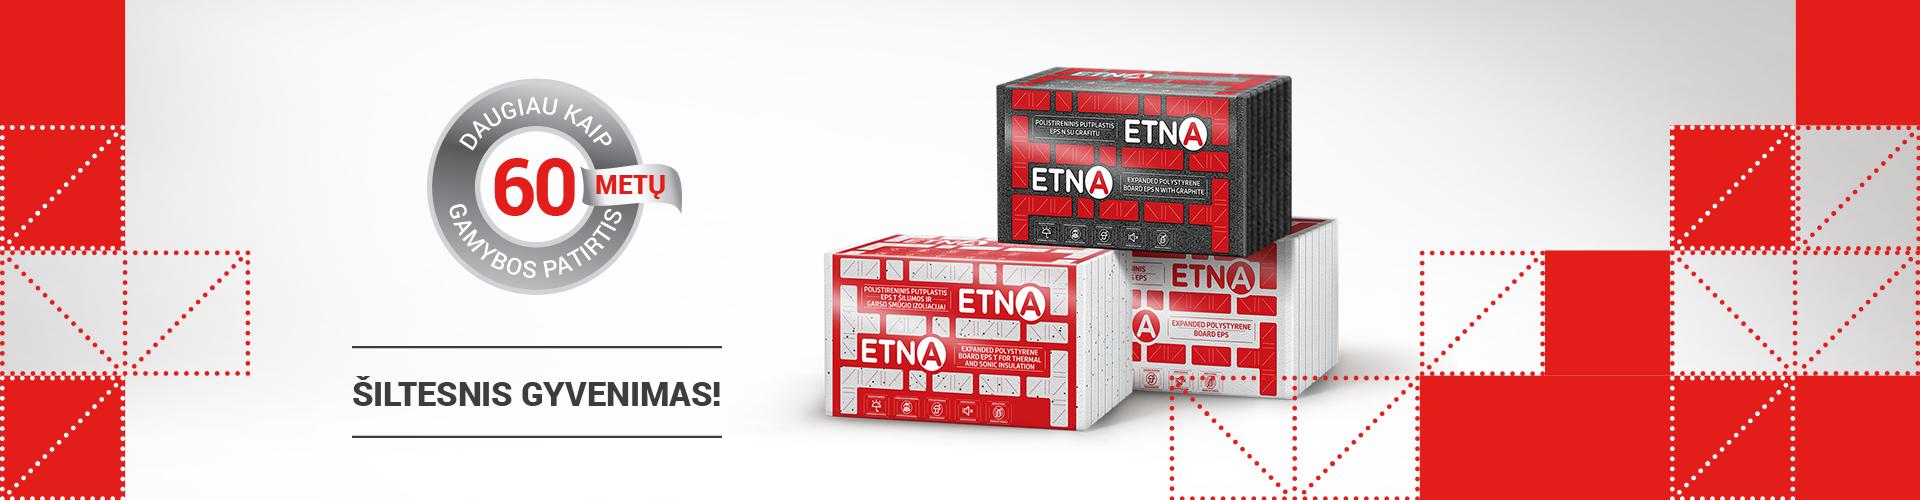 Etna-Polistireninis-putplastis